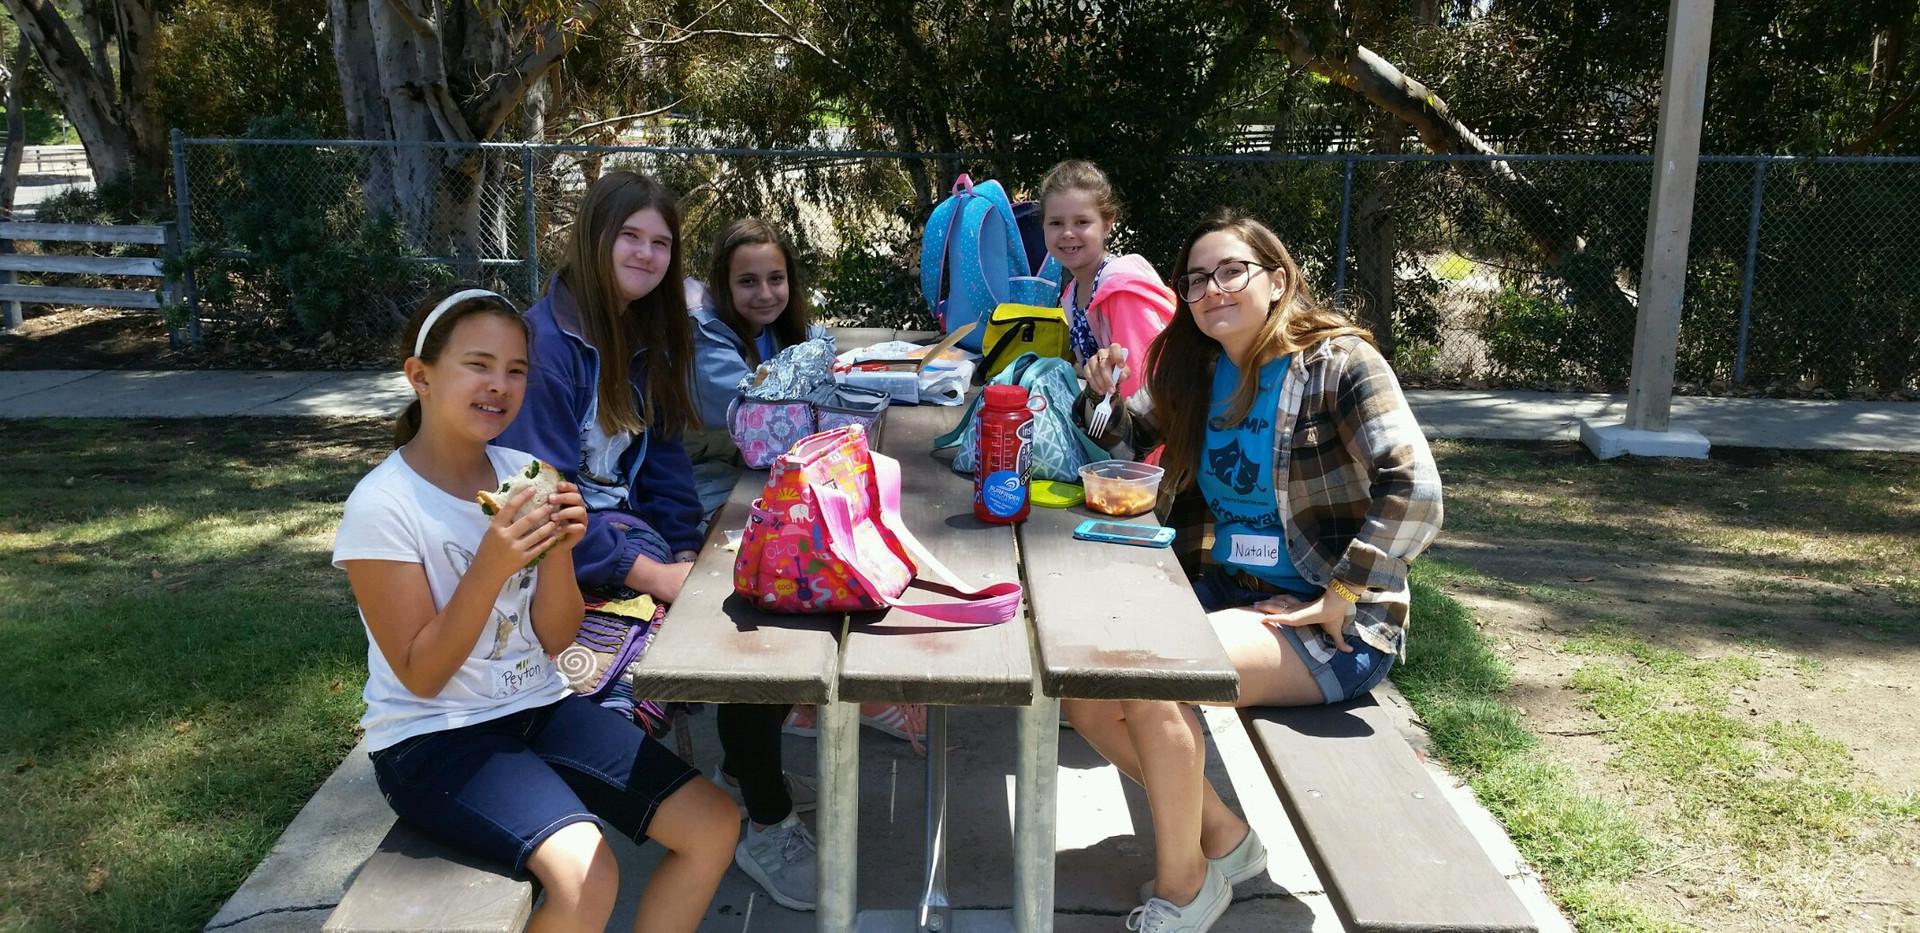 Camp Bound for Broadway Little Mermaid in Ventura